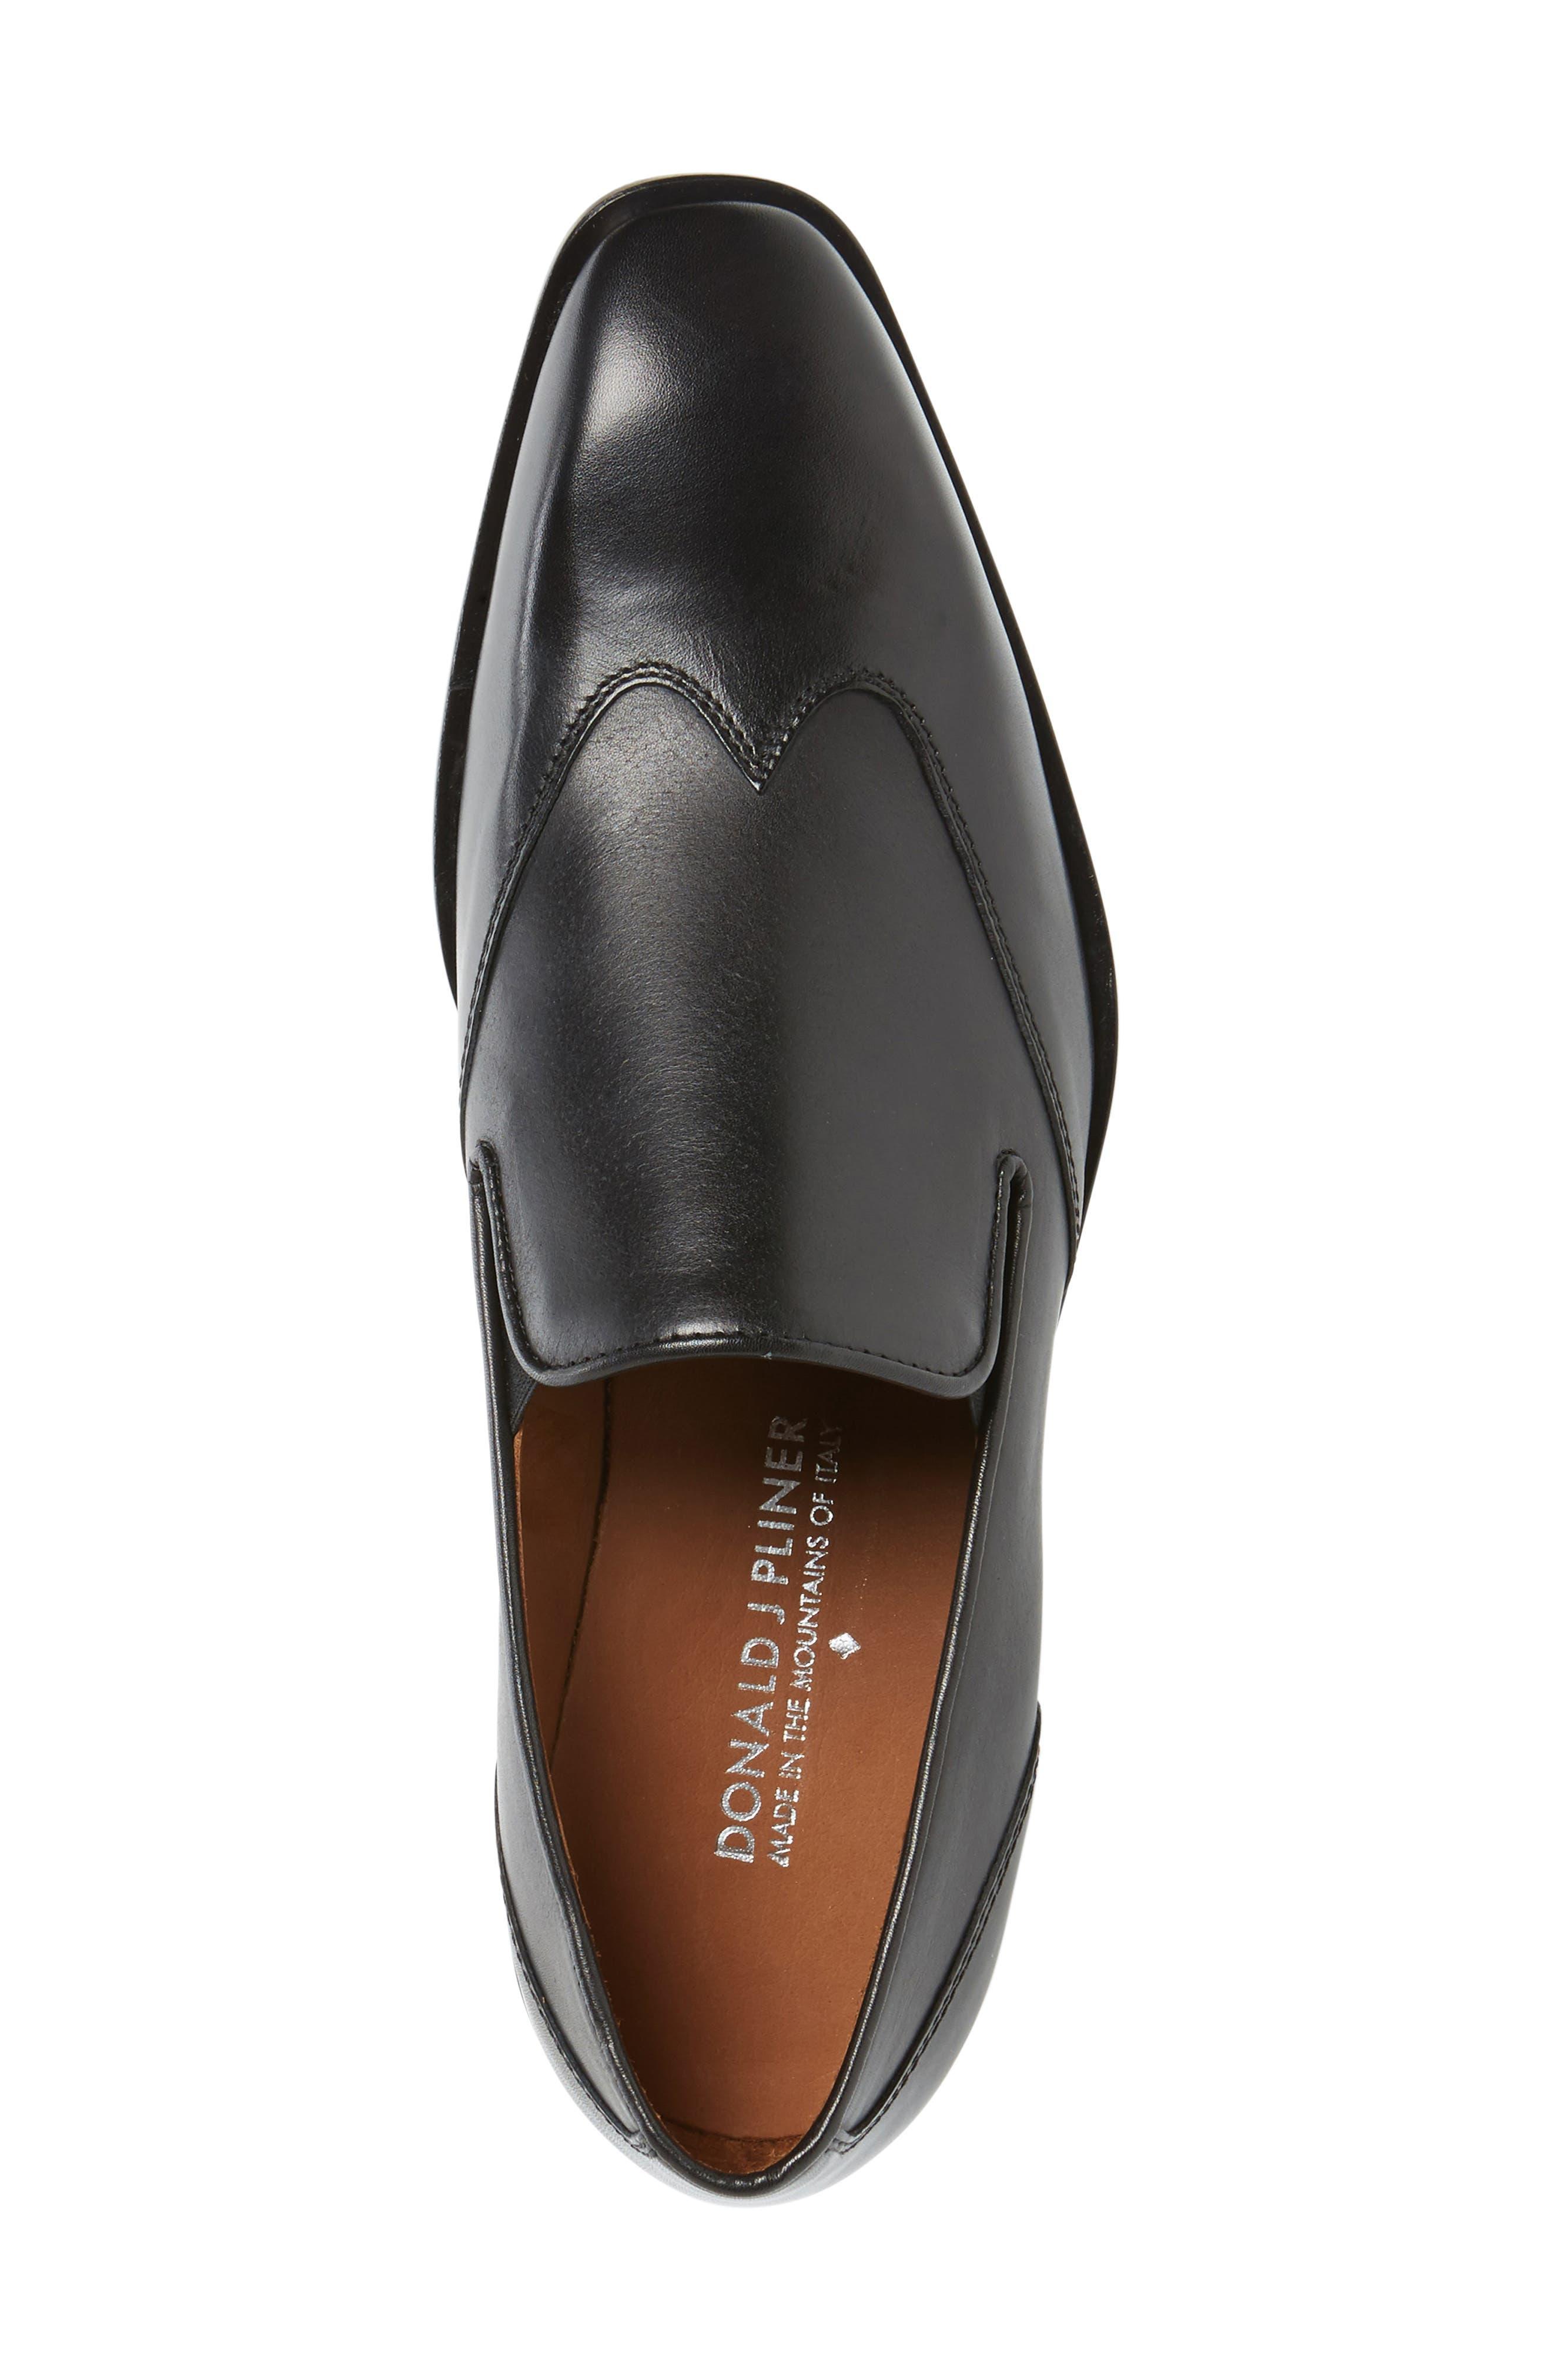 Valente Venetian Loafer,                             Alternate thumbnail 3, color,                             Black Leather